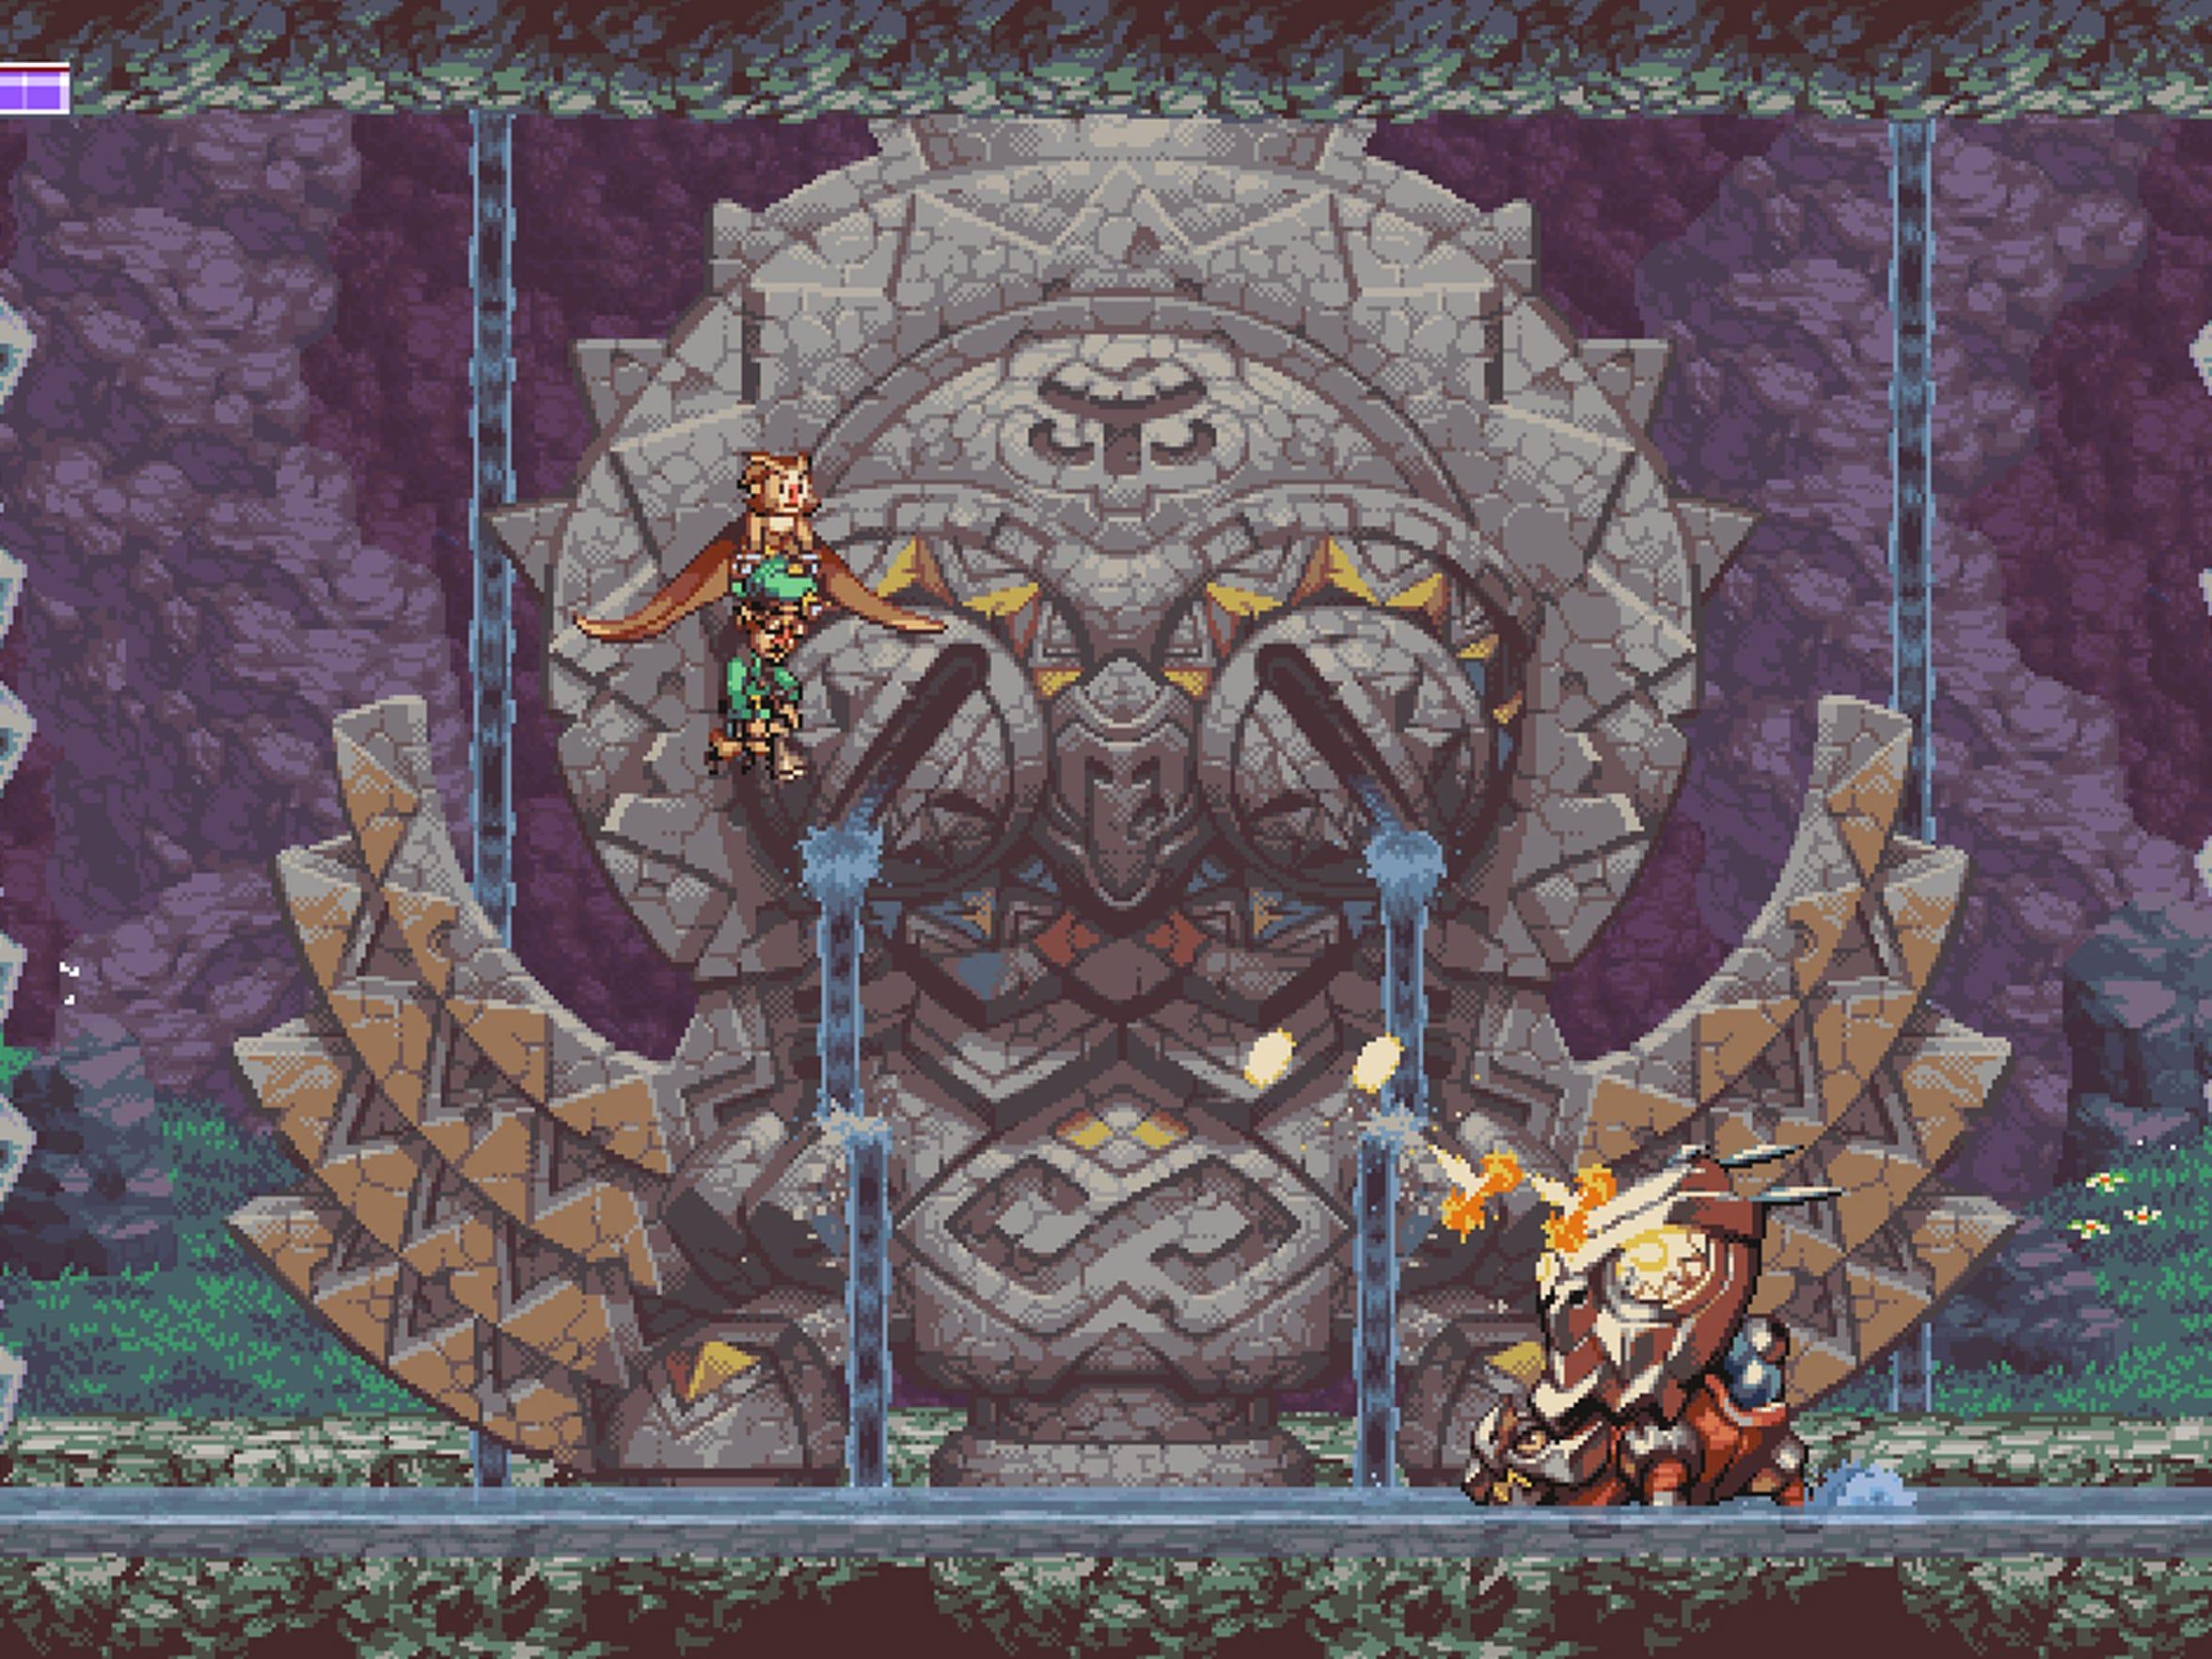 Owlboy uses classic old-school gaming mechanics such